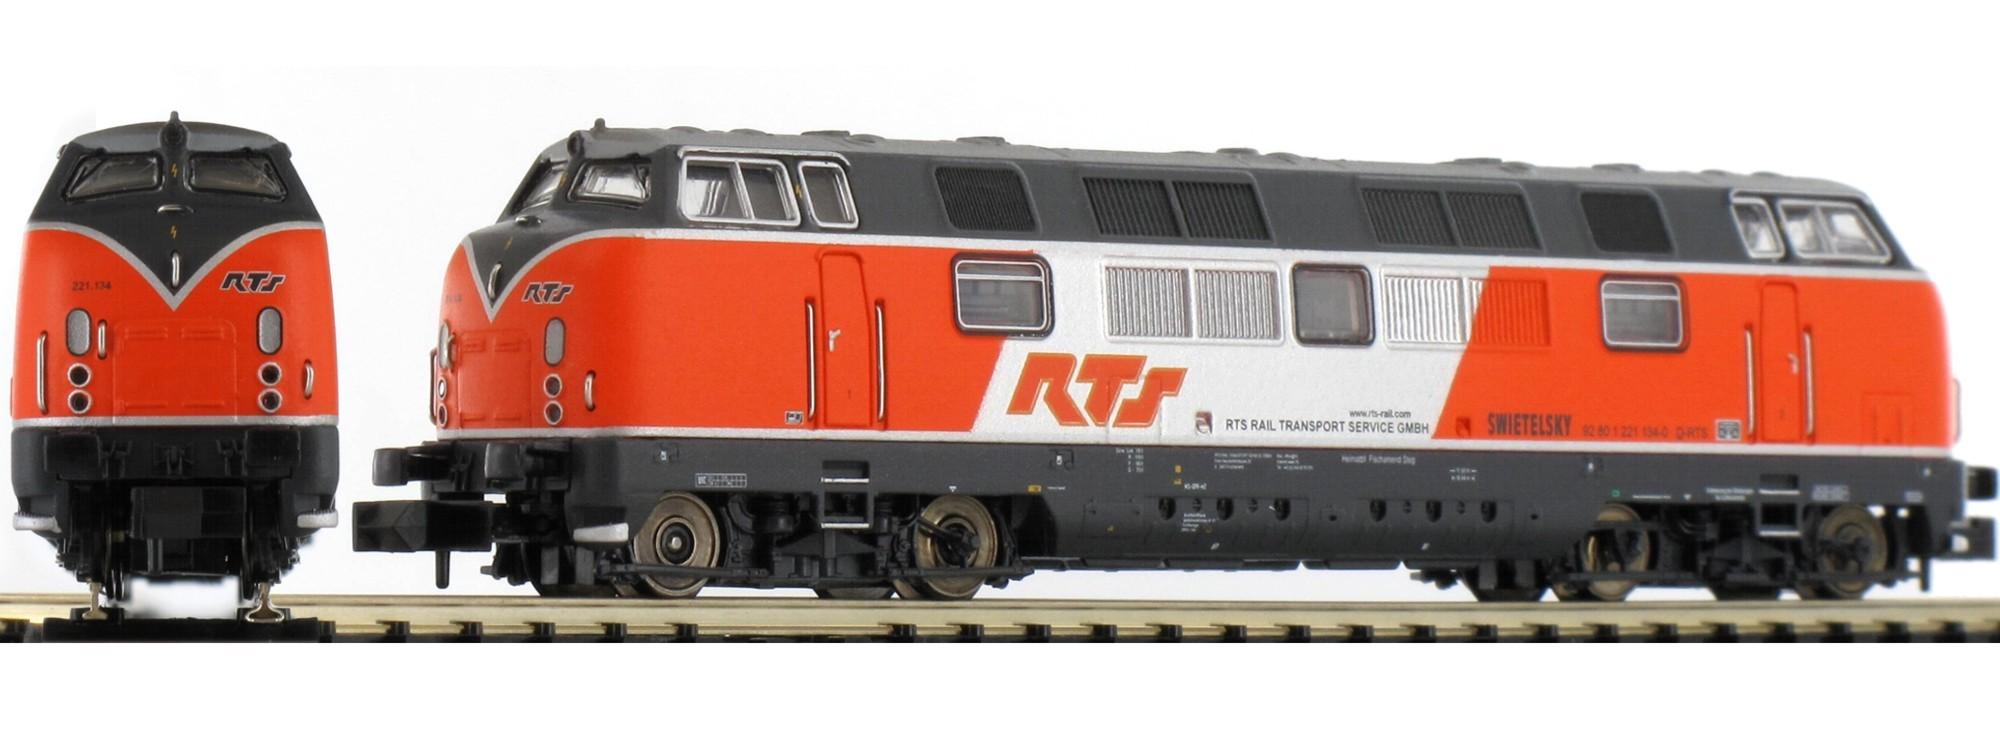 N Scale - Minitrix - 16202 - Locomotive, Diesel, DB V200 - RP Transfer - 221 134-0